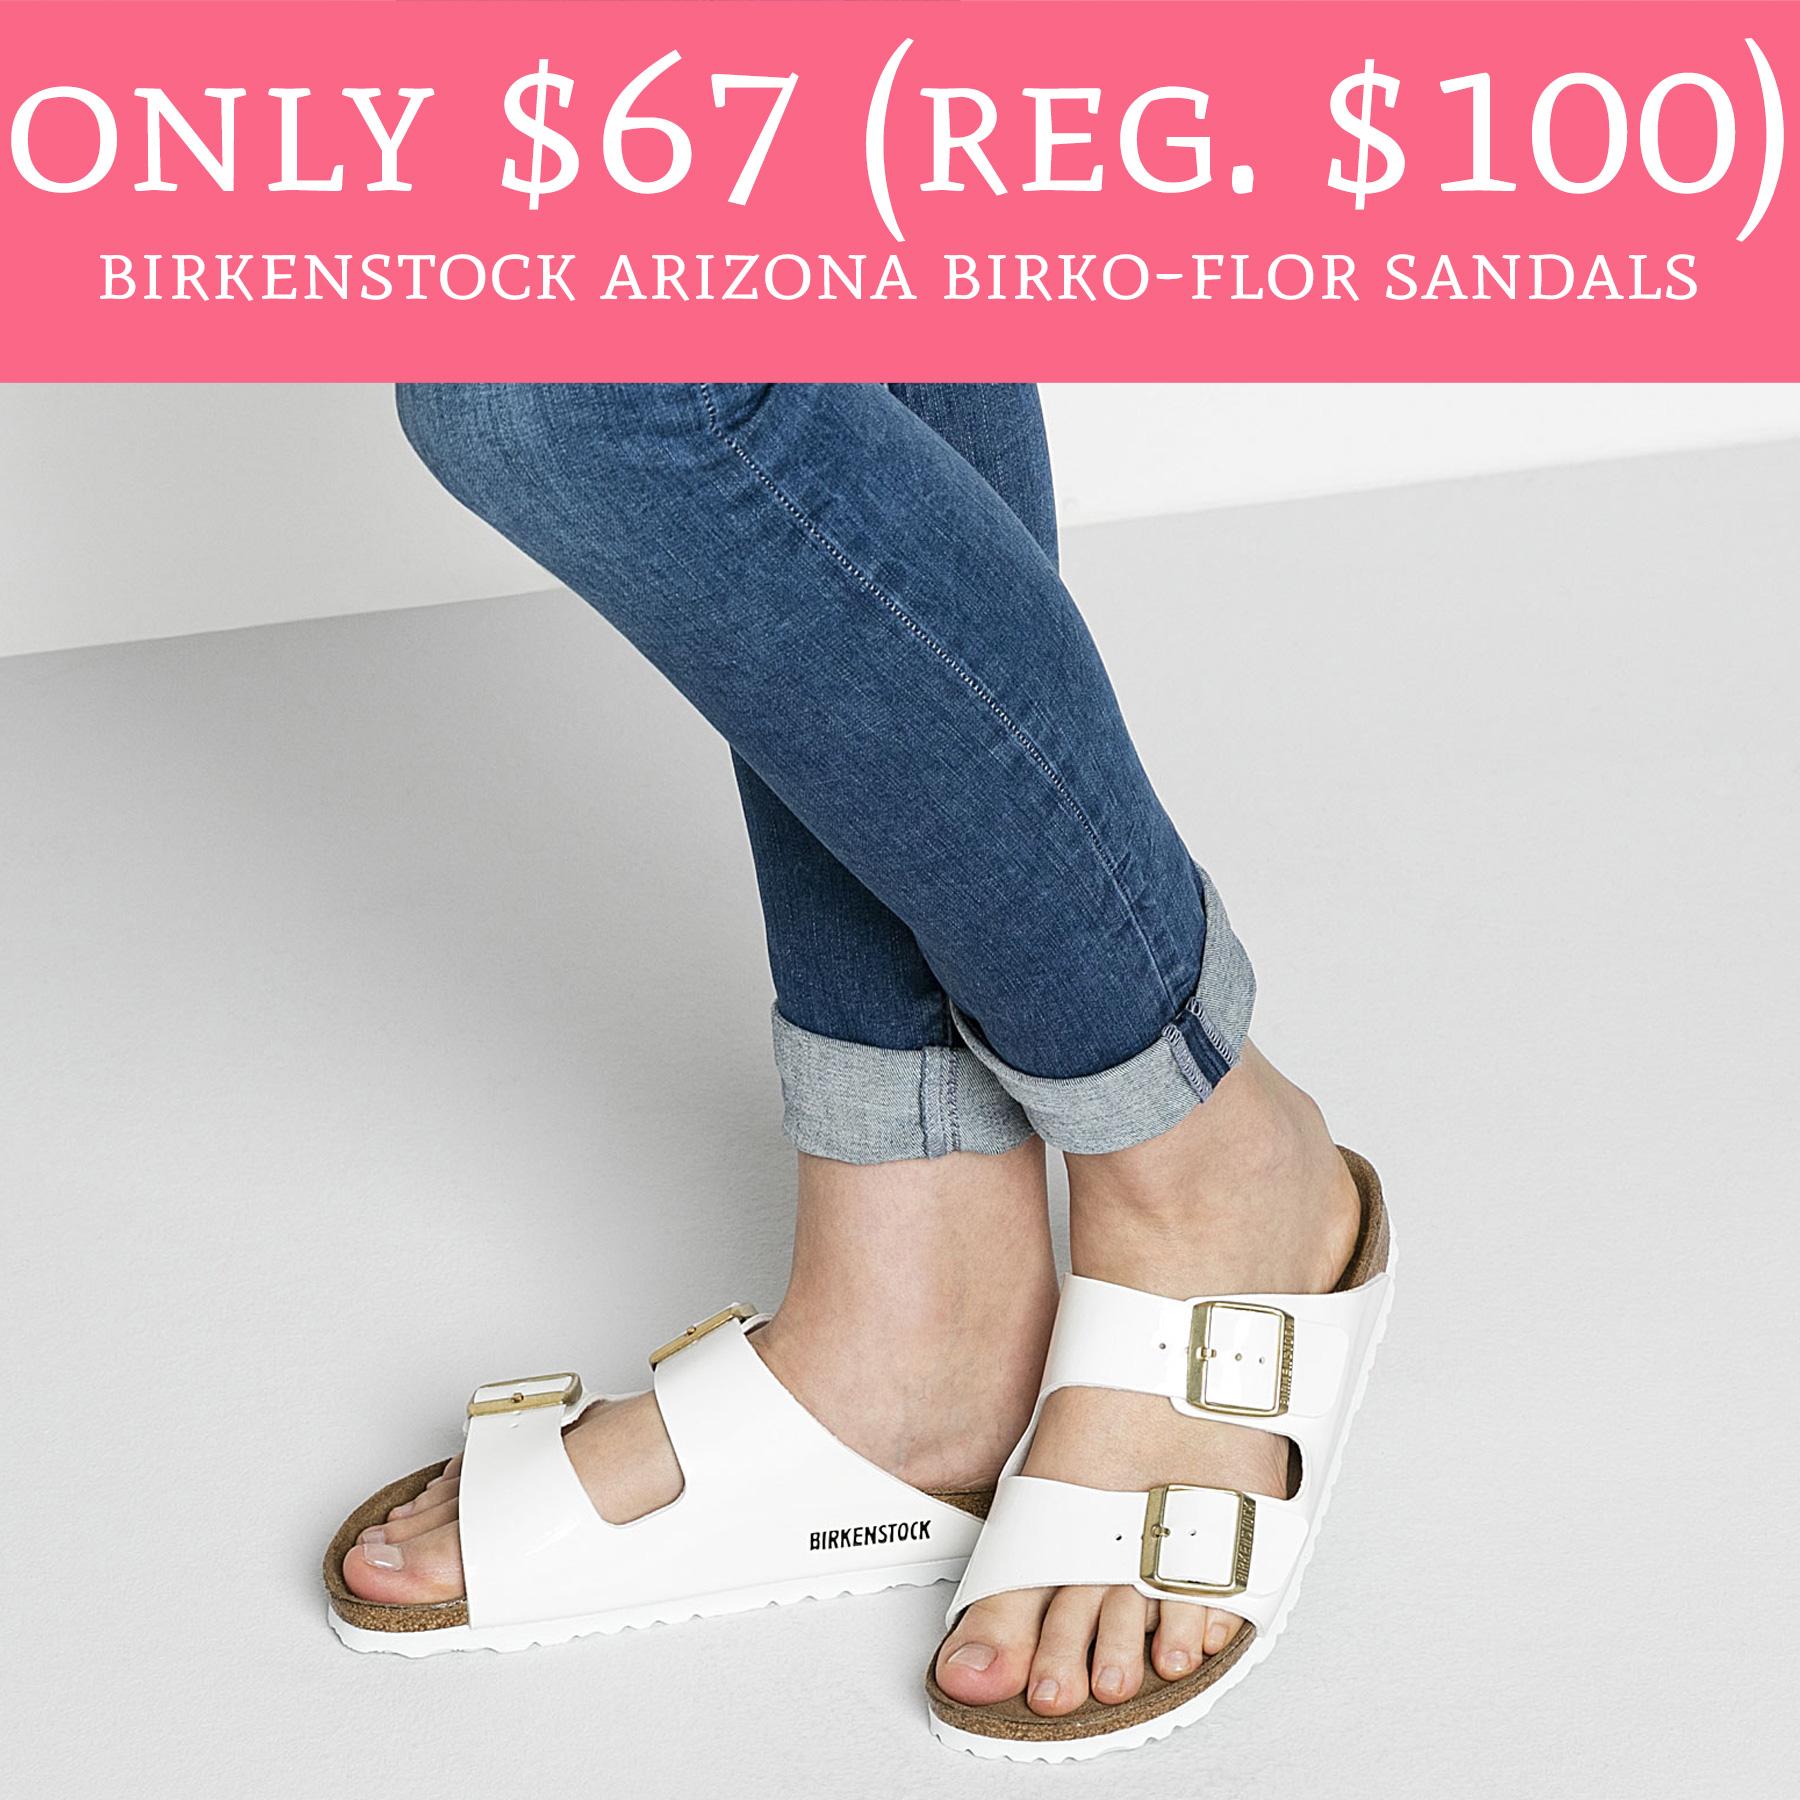 3954124fb677 Only  67 (Regular  100) Birkenstock Arizona Birko-Flor Sandals ...